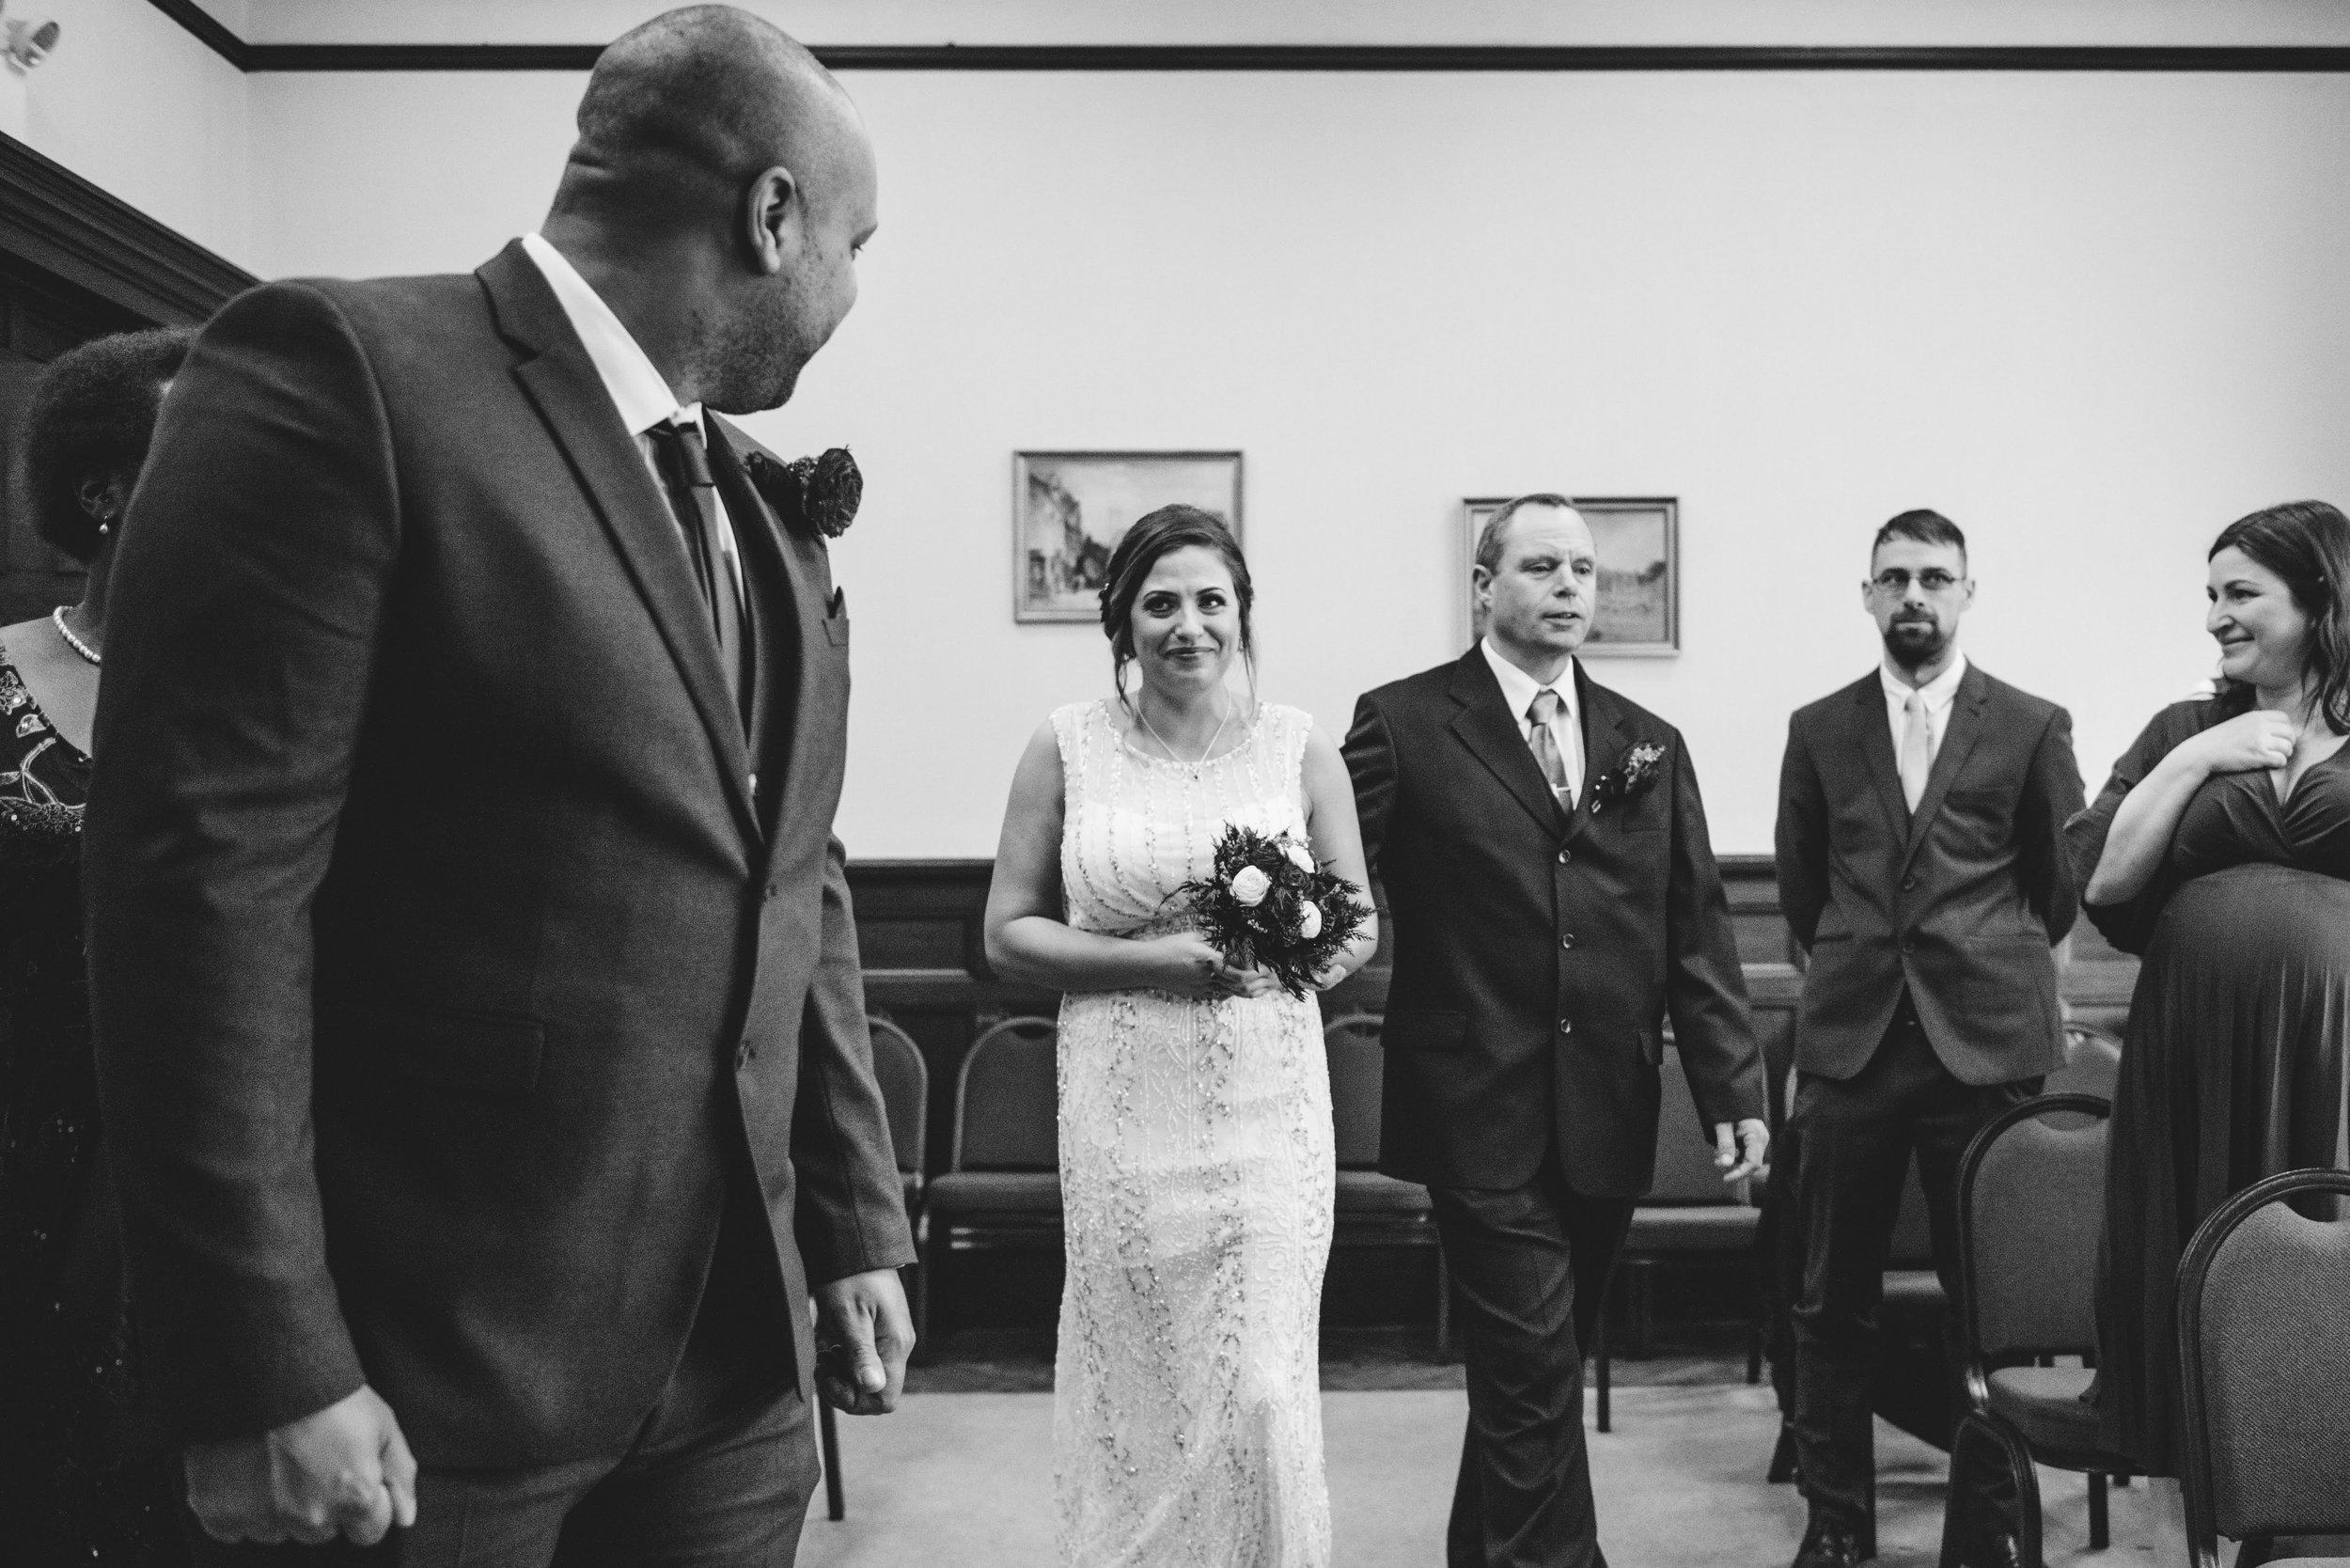 Wedding photographer Lincoln